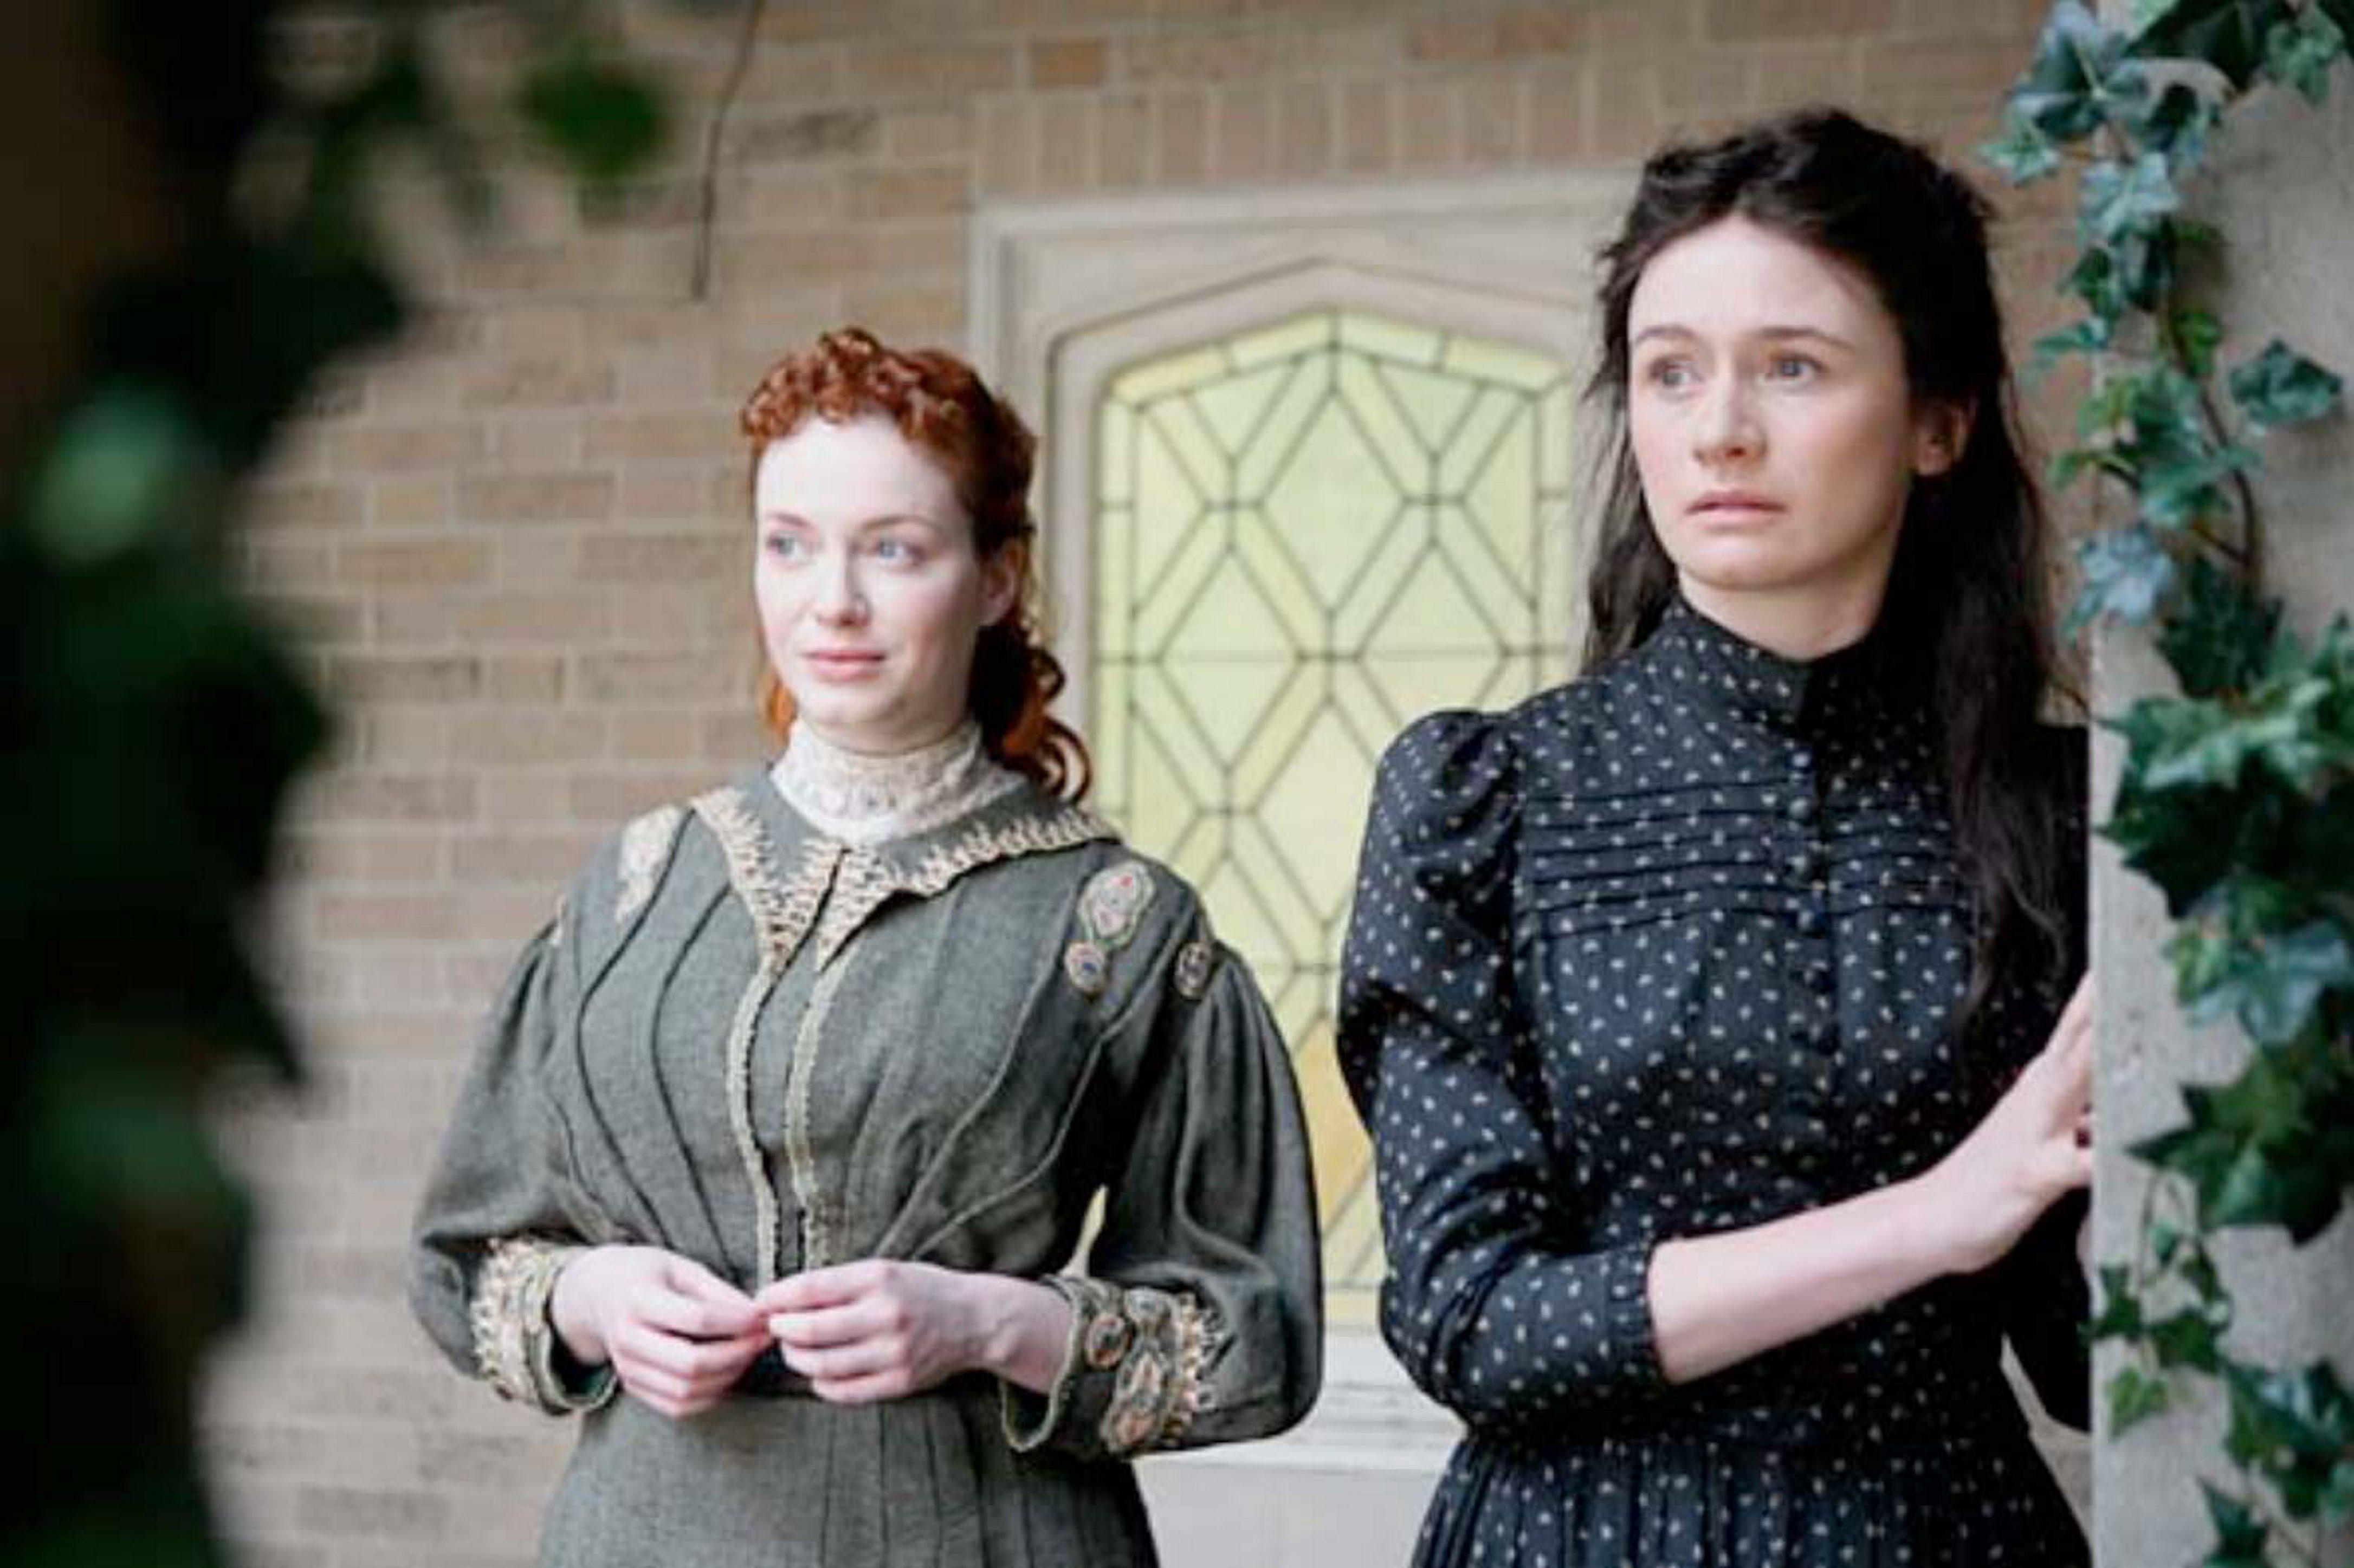 Christina Hendricks as Catherine and Emily Mortimer as Leonie in 'Leonie.'